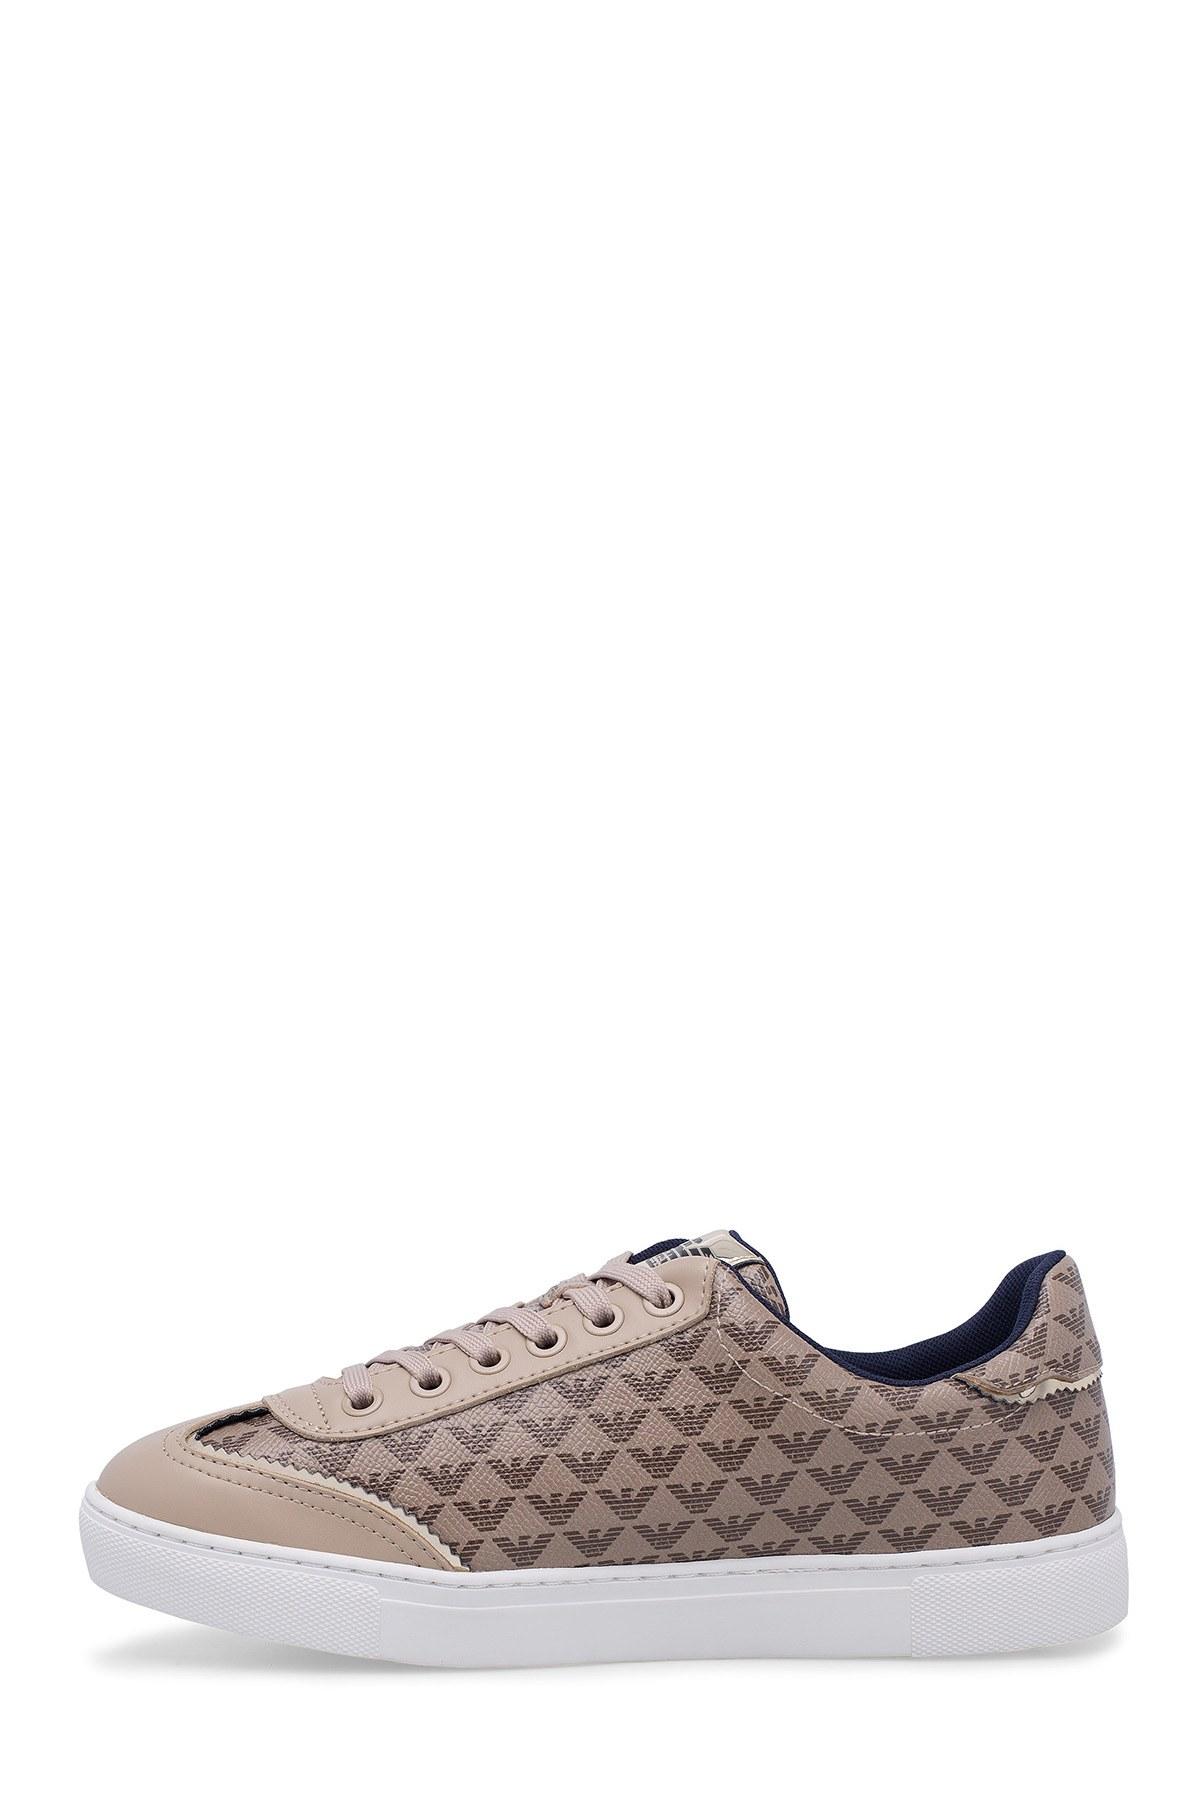 Emporio Armani Kadın Ayakkabı S X3X083 XM056 R533 VİZON